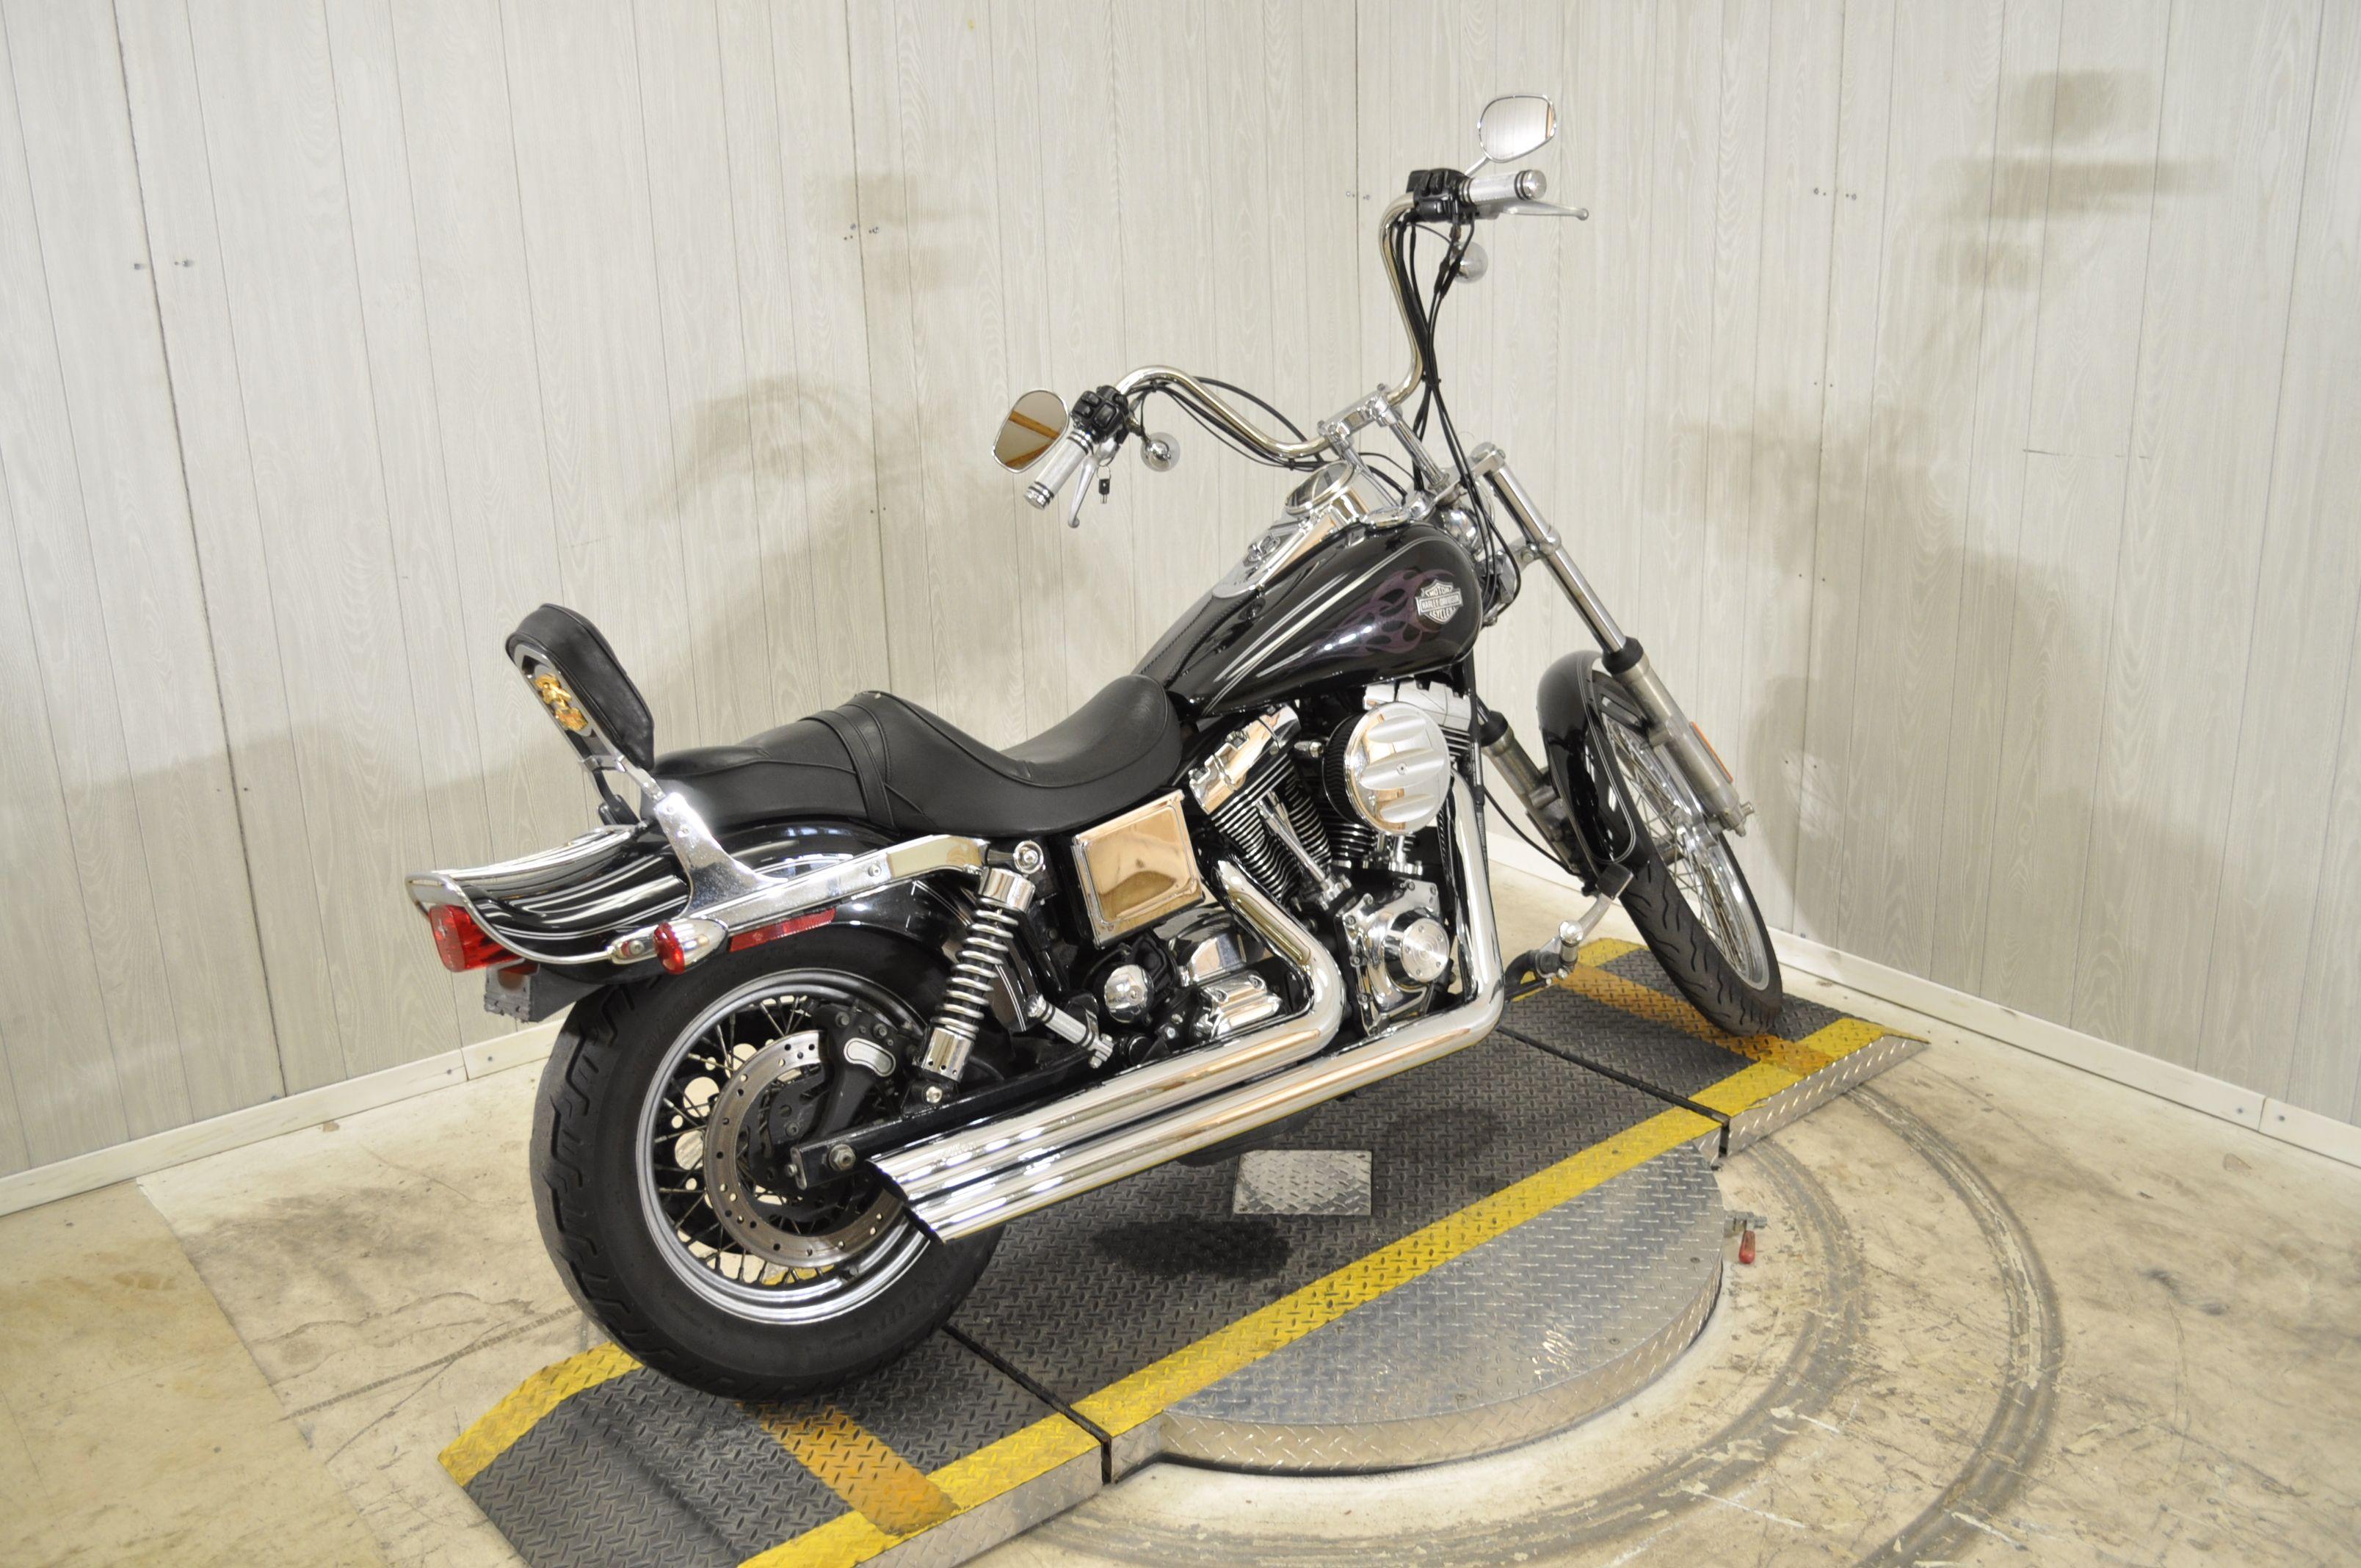 Pre-Owned 2005 Harley-Davidson Wide Glide FXDWG